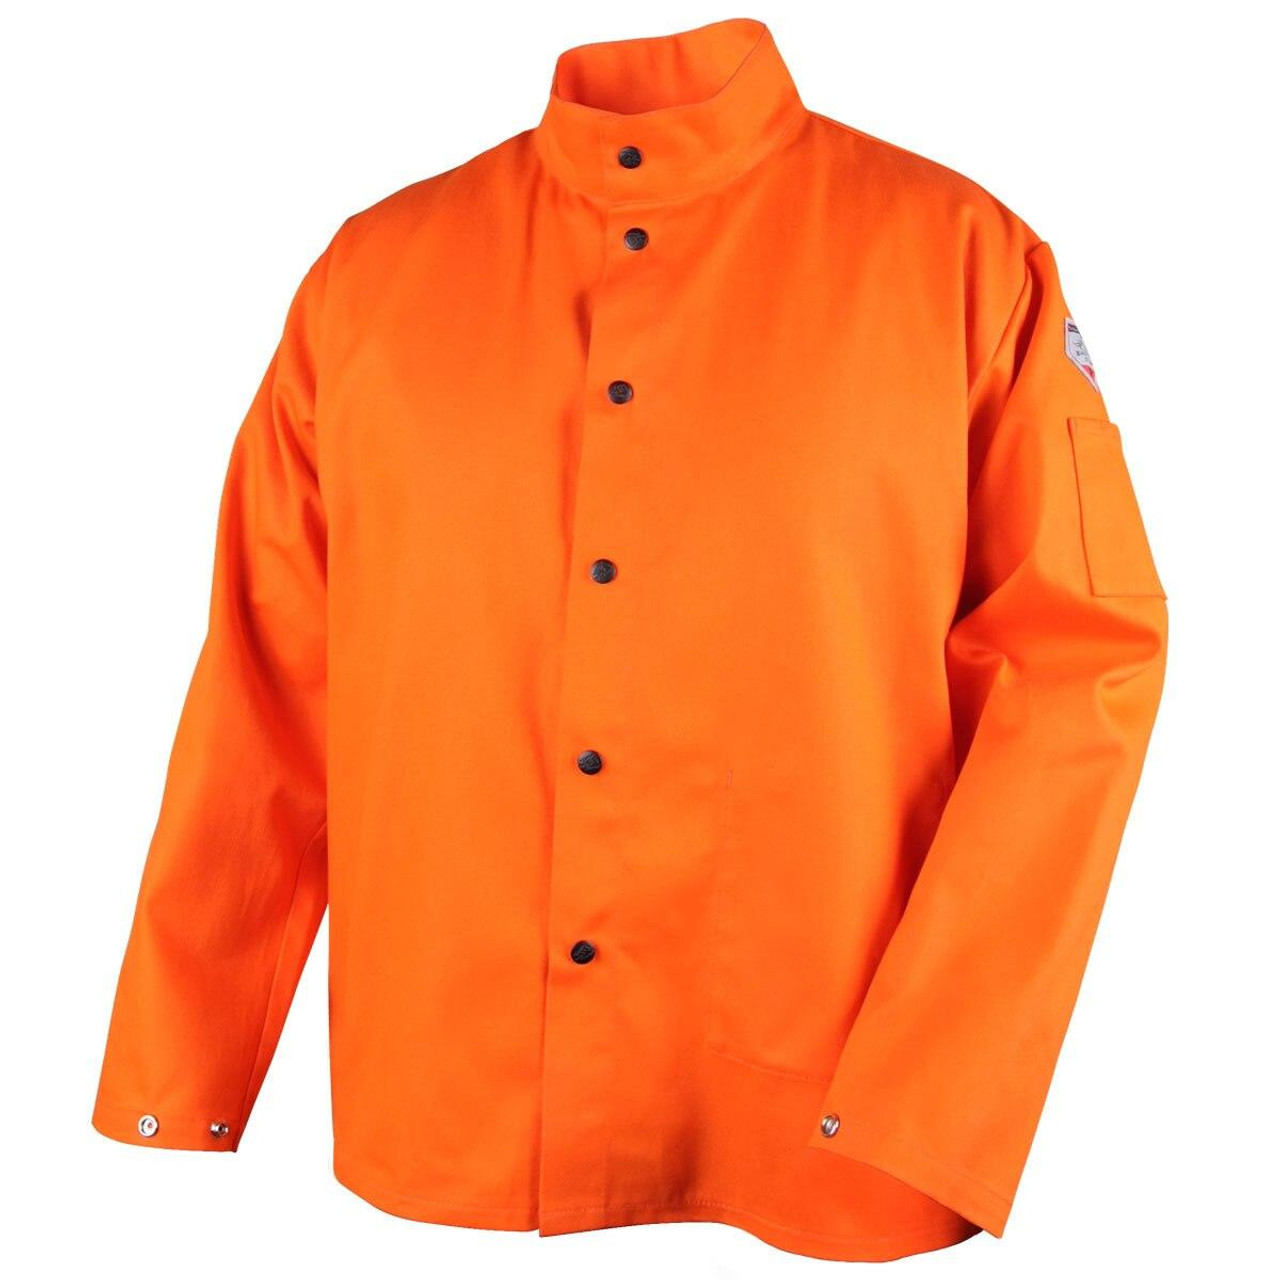 Revco FO9-30C TruGuard 200 FR Cotton Welding Jacket Orange